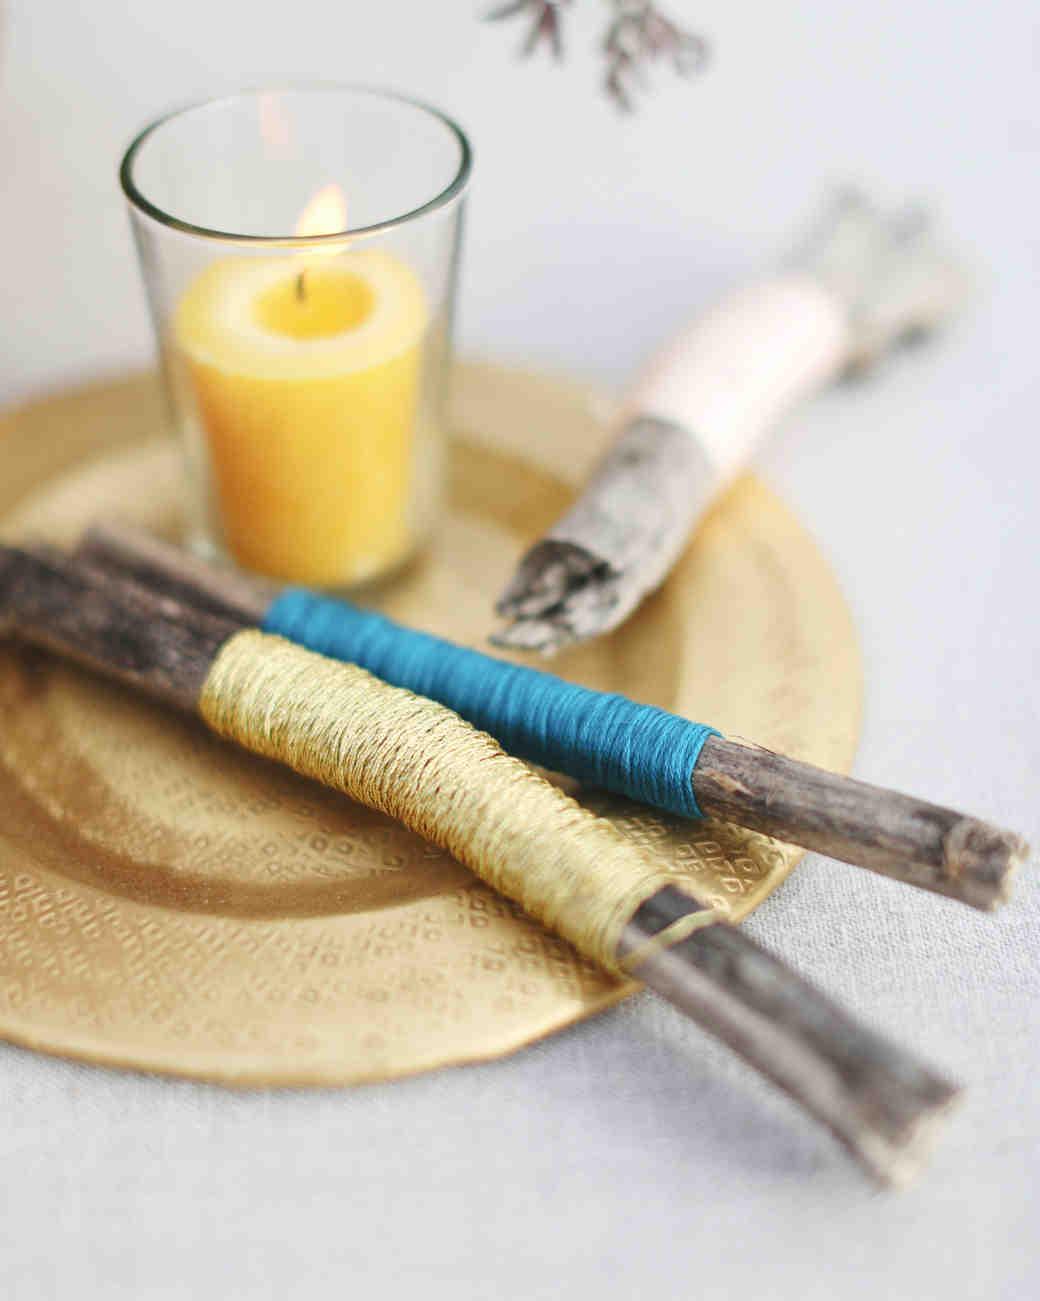 christen-billy-wedding-sticks-046-011-s111597-1014.jpg